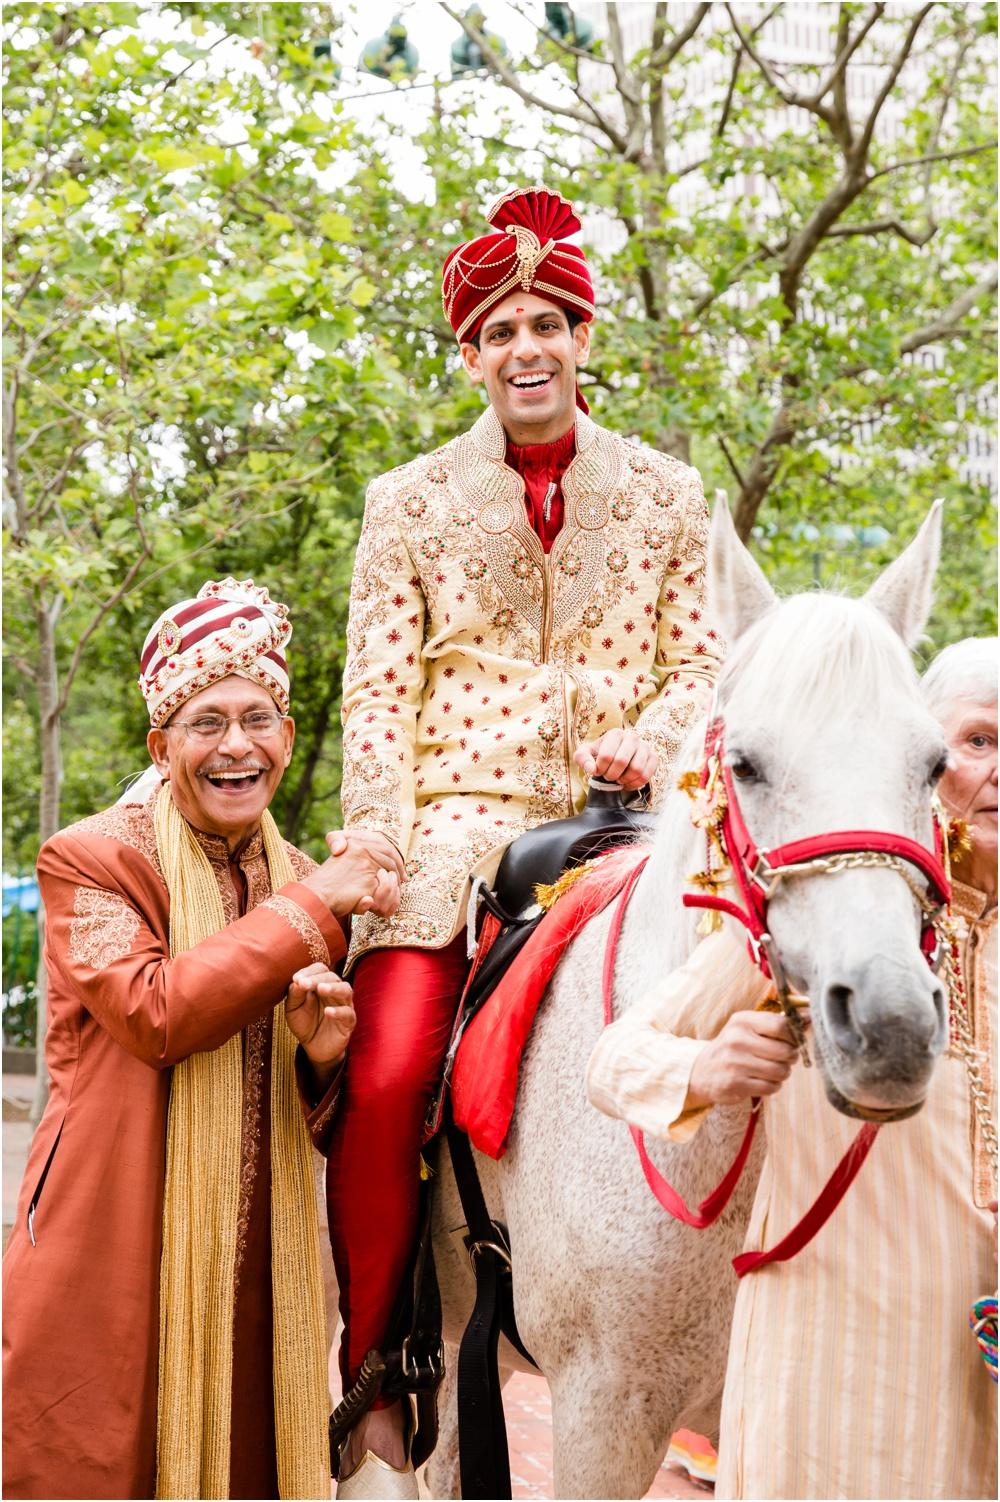 RI-Wedding-Photographer-Lefebvre-Photo-Blog_2818.jpg